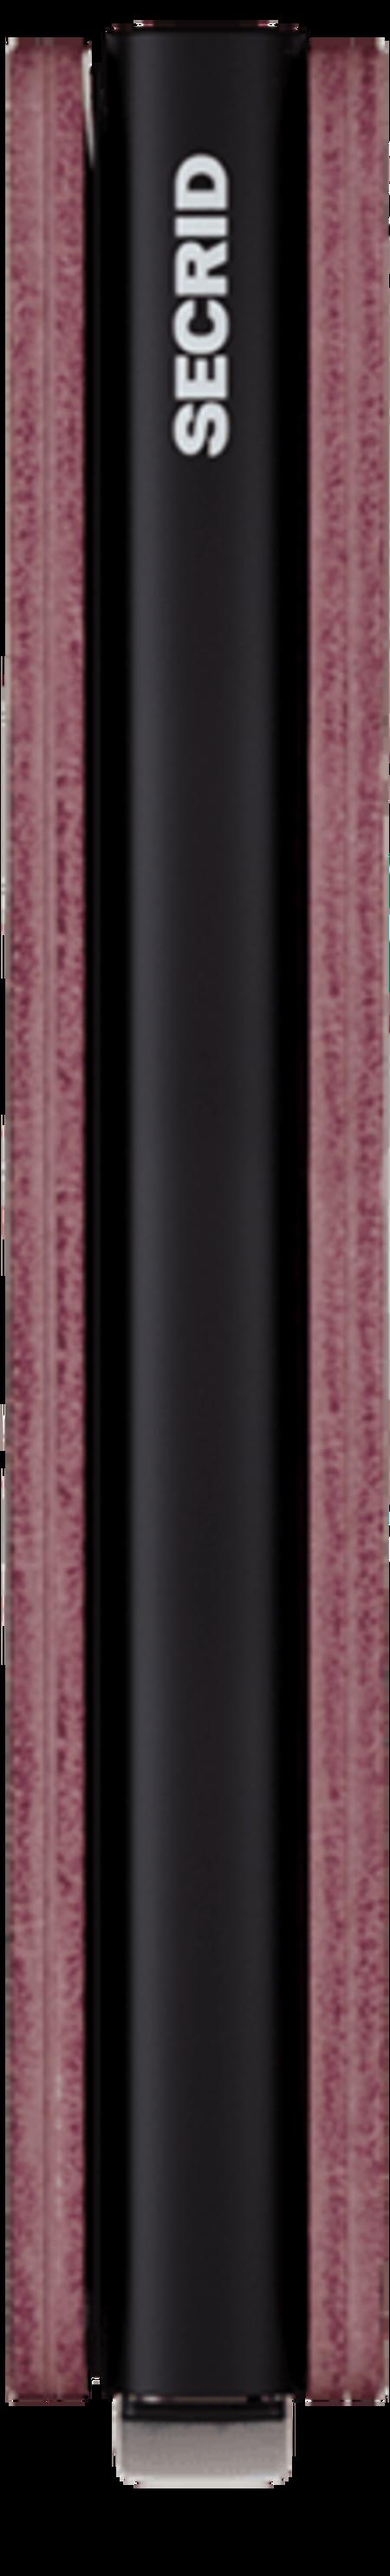 Secrid Slimwallet - Dutch Martin Bordeaux